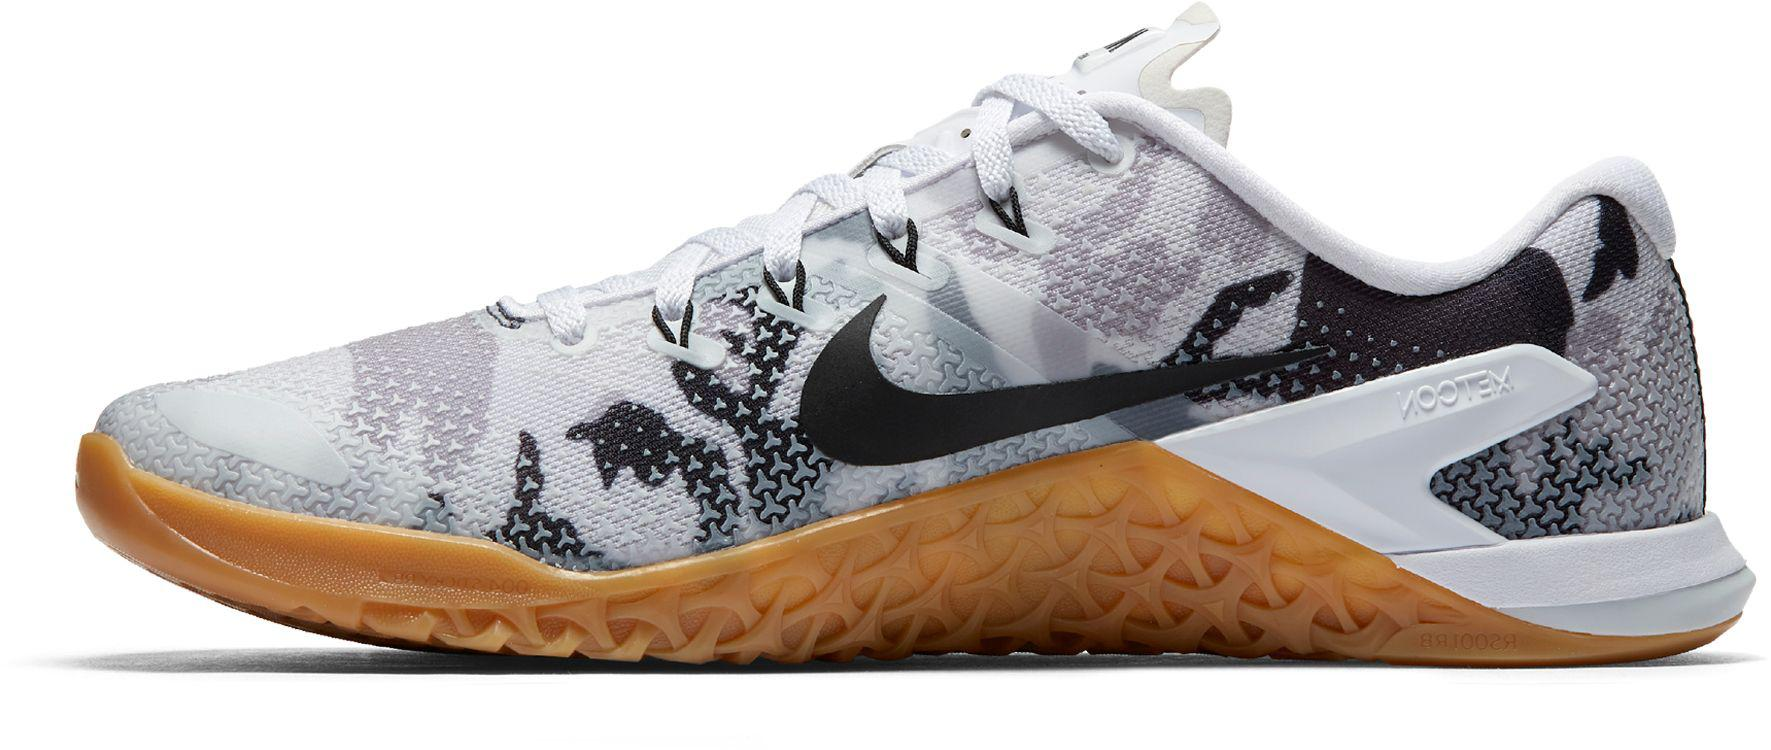 Metcon 4 Camo Training Shoes